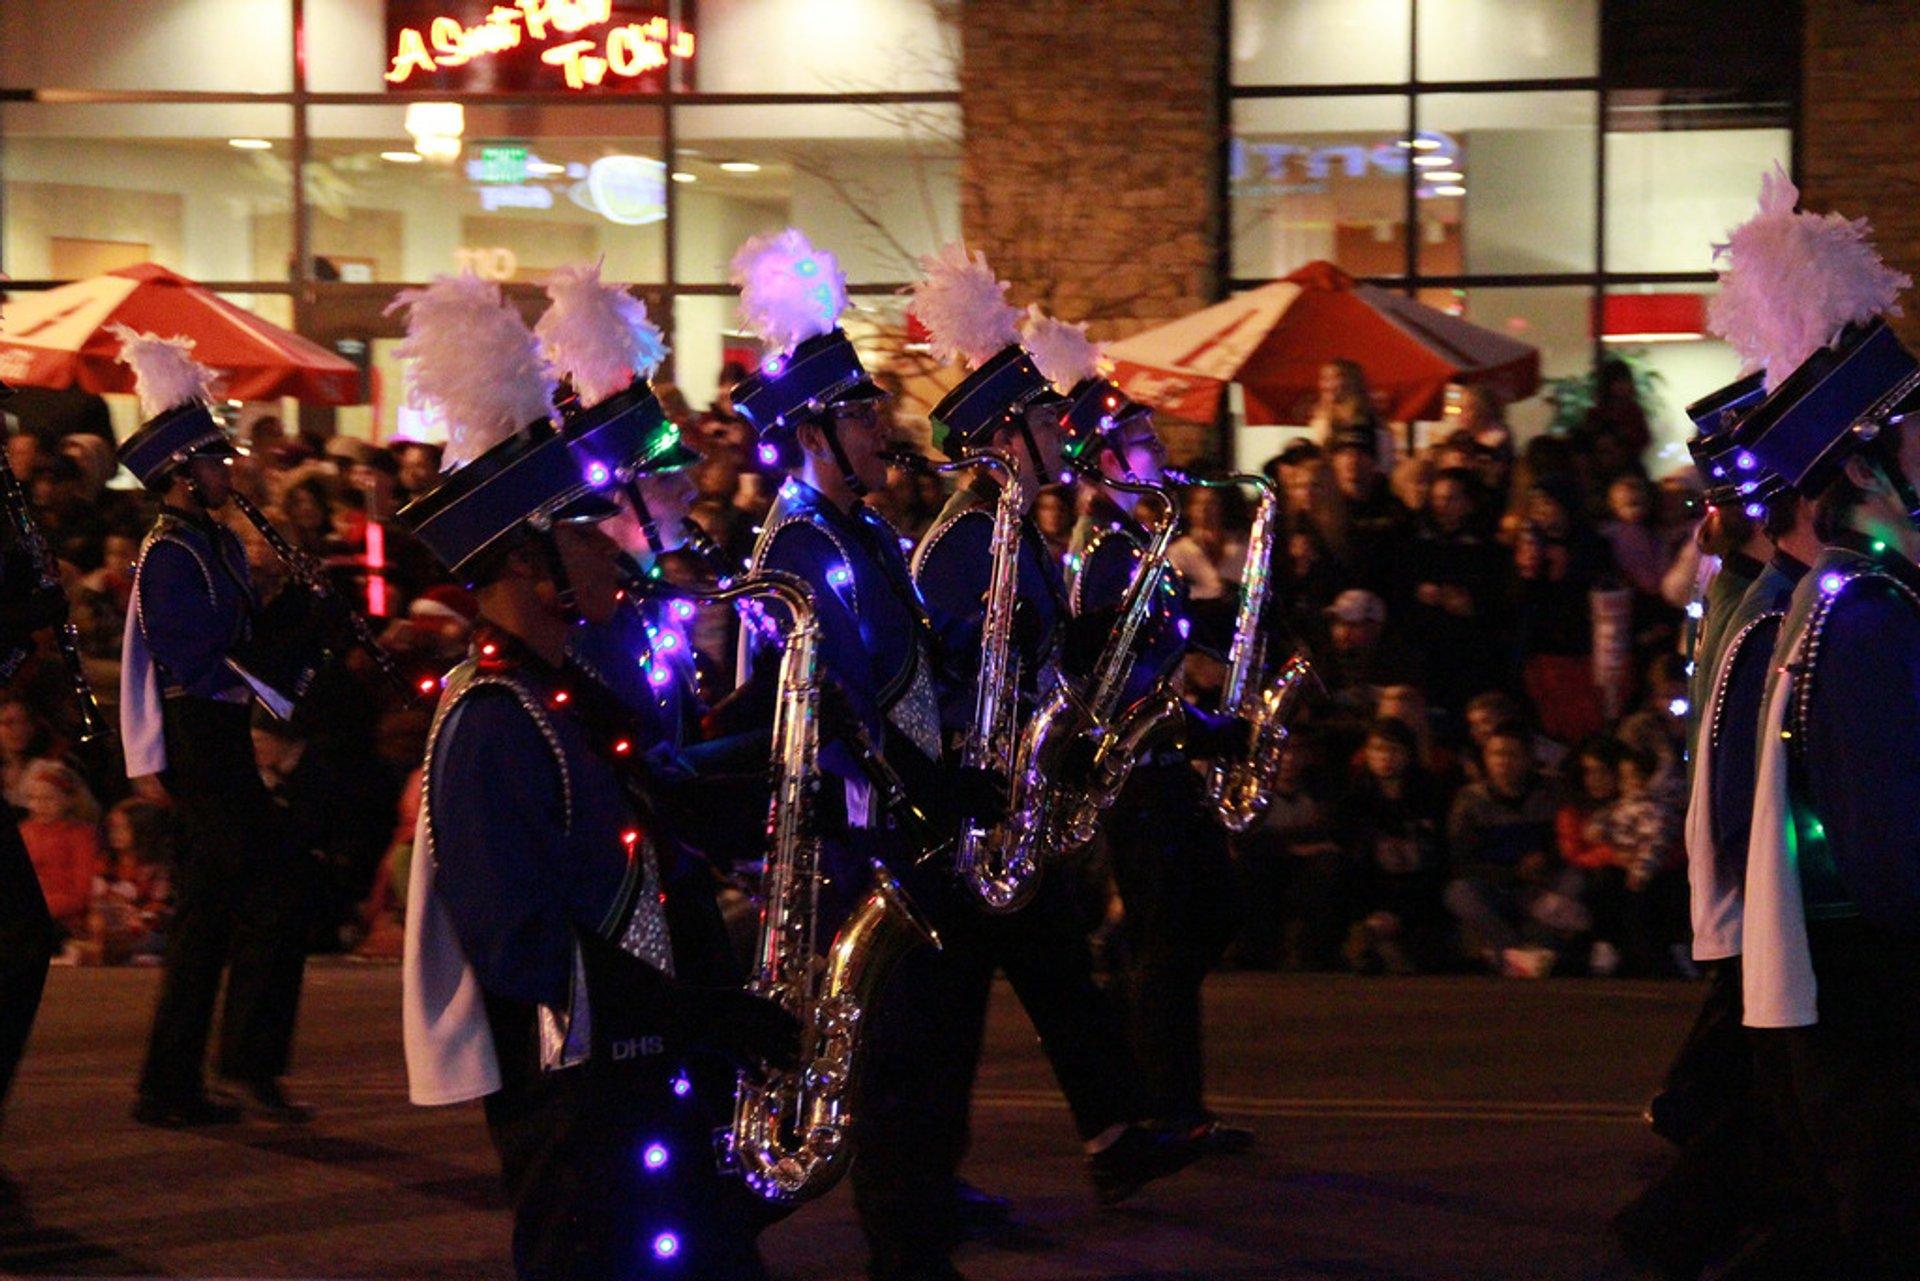 Colorado Springs Festival of Lights in Colorado 2019 - Best Time